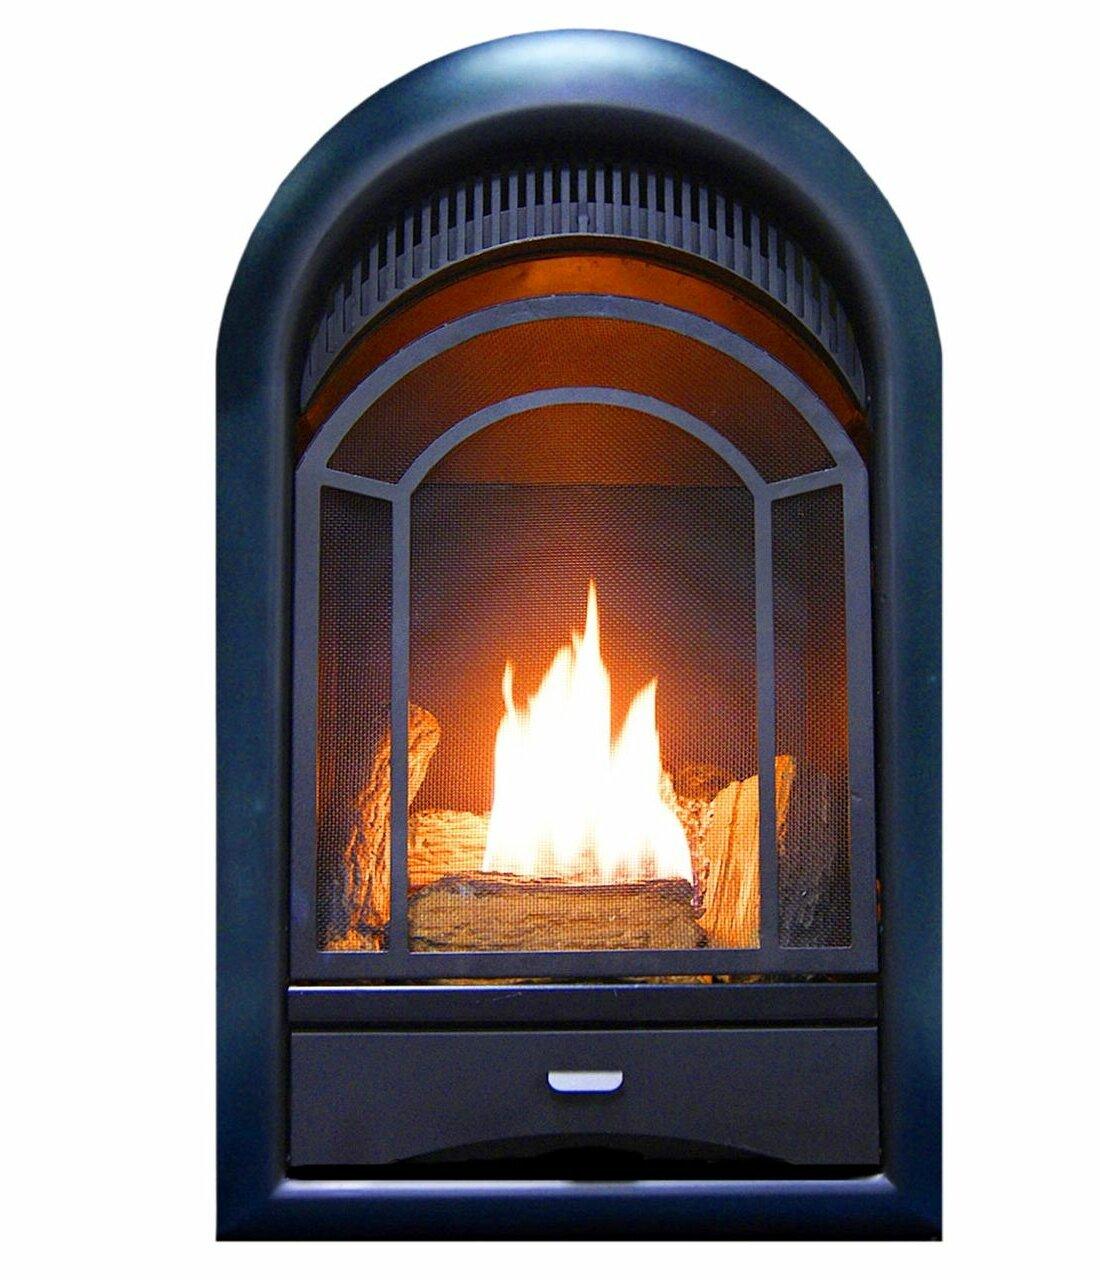 alpha-ene.co.jp Barton Premium 18-inch Vent-Free Natural Gas Log ...